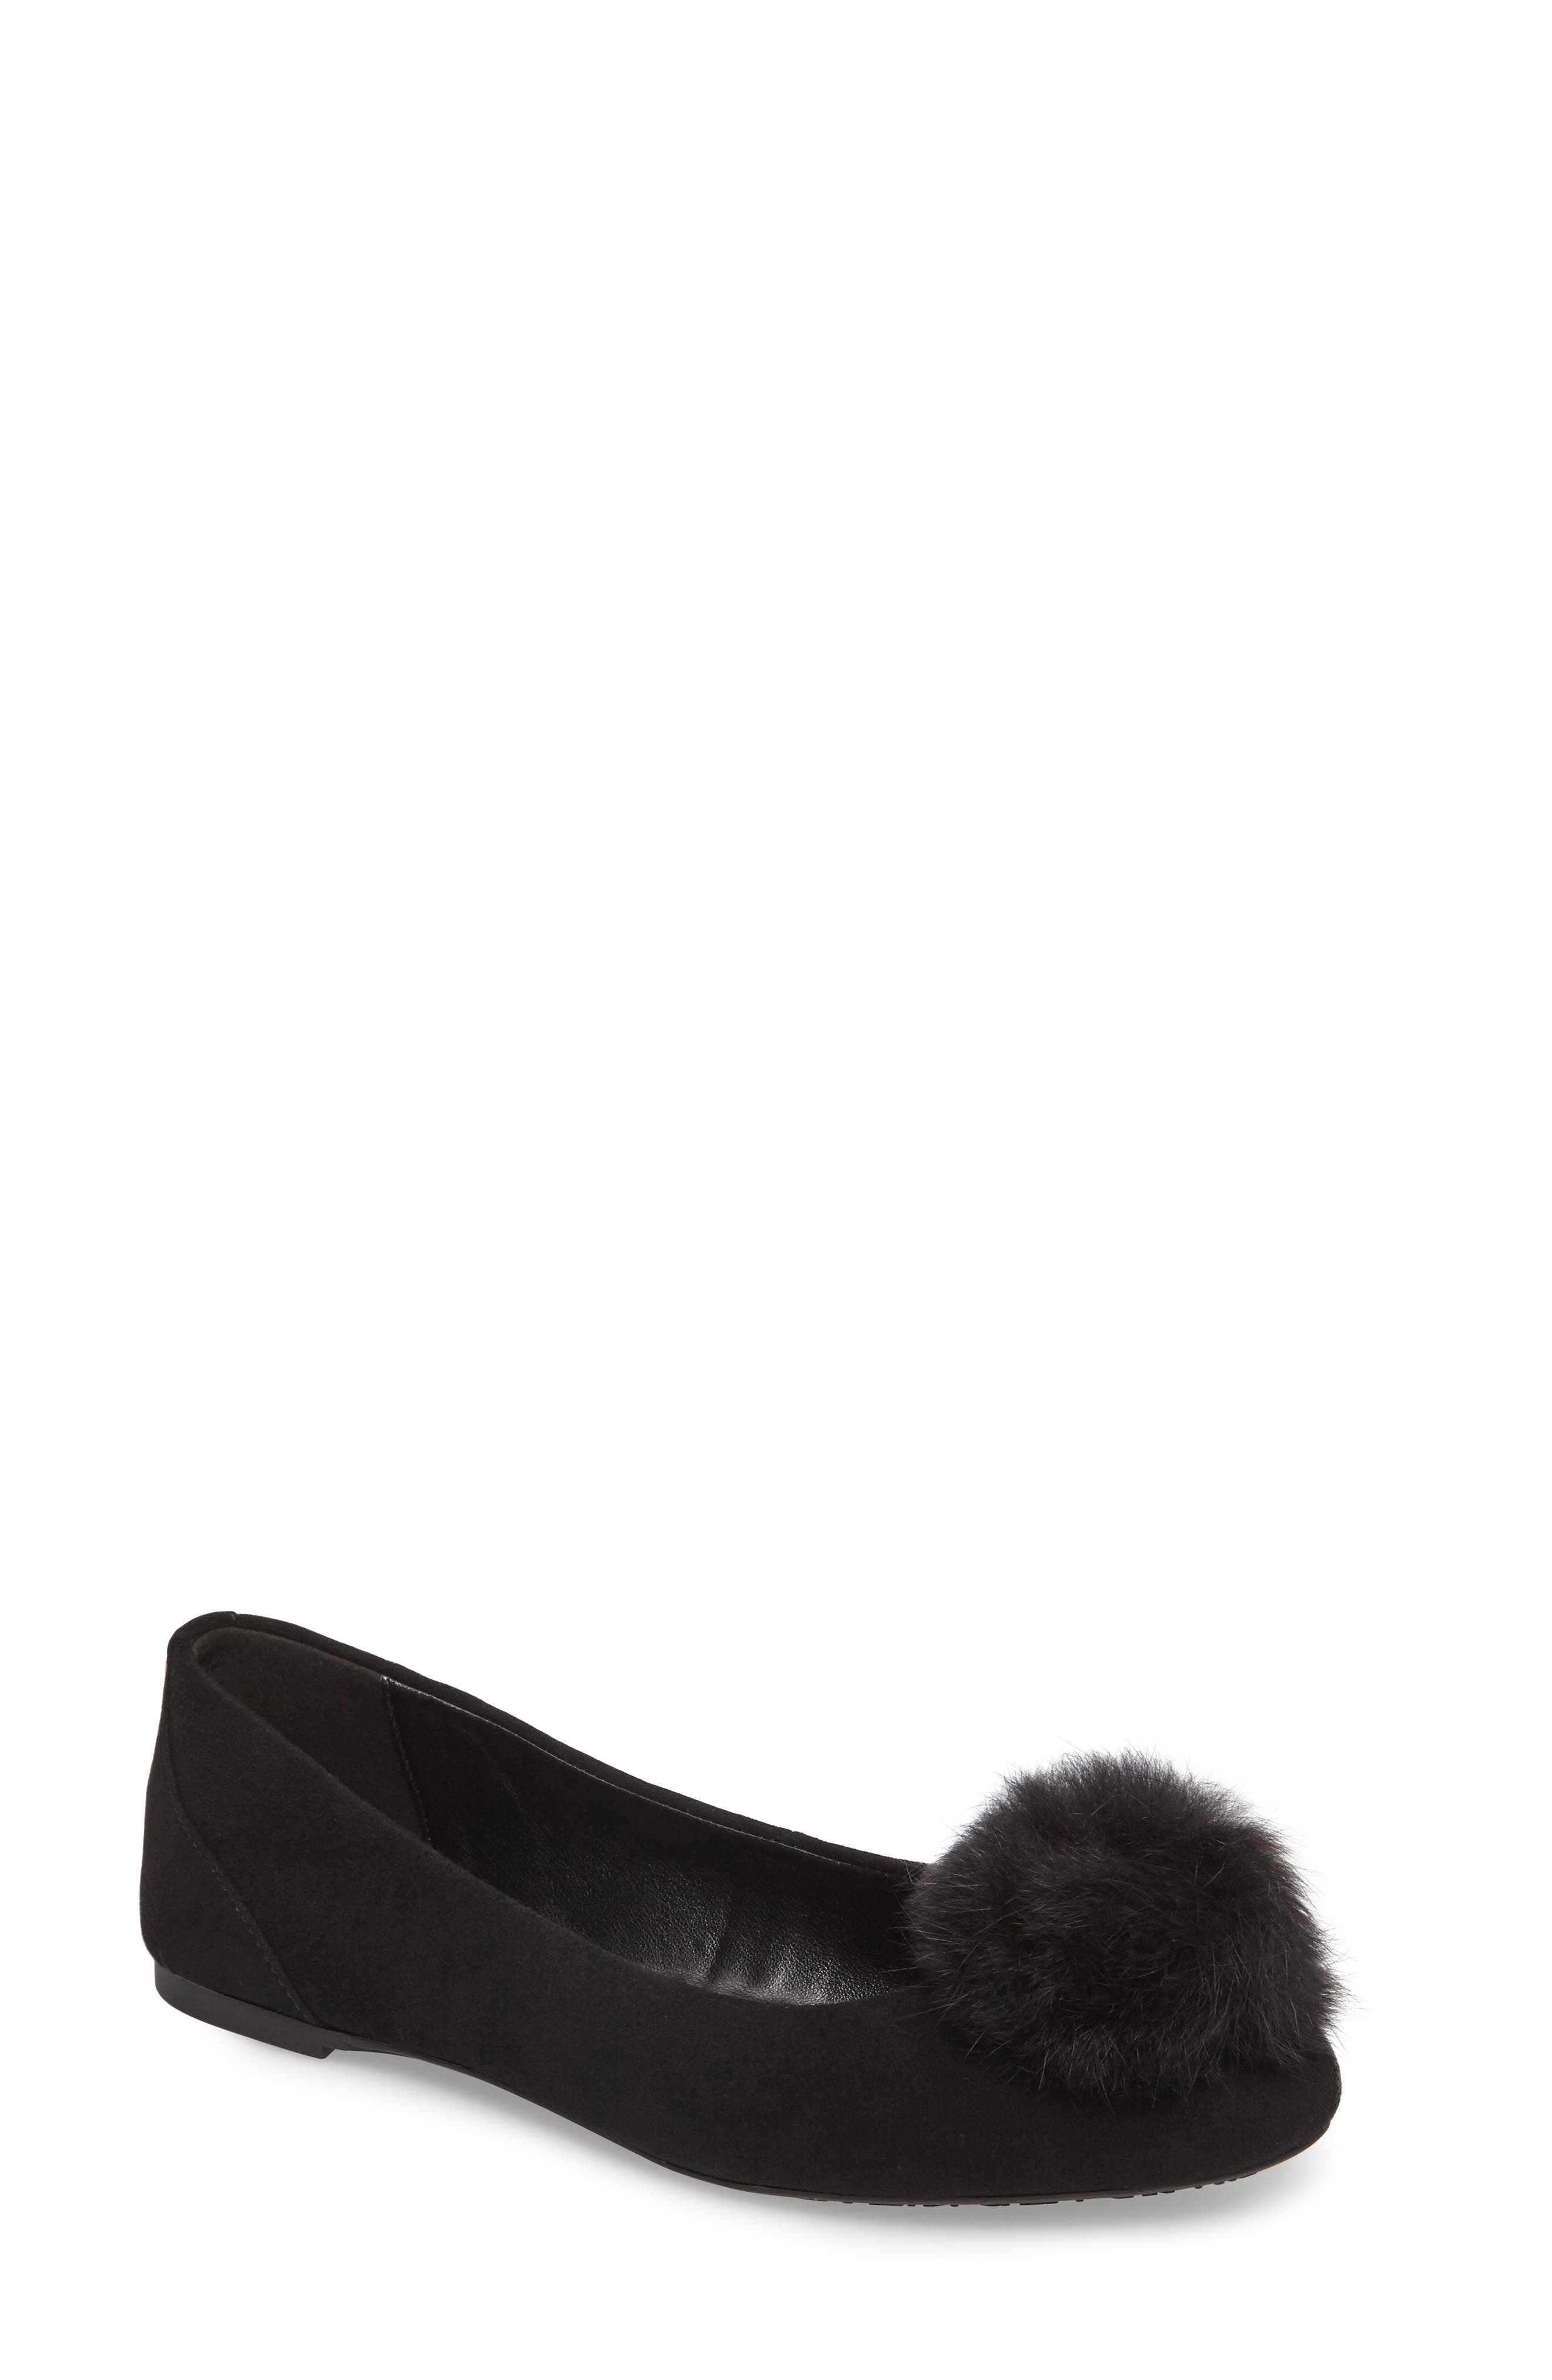 Remi Ballet Flat with Genuine Rabbit Fur Pom,                         Main,                         color, 001